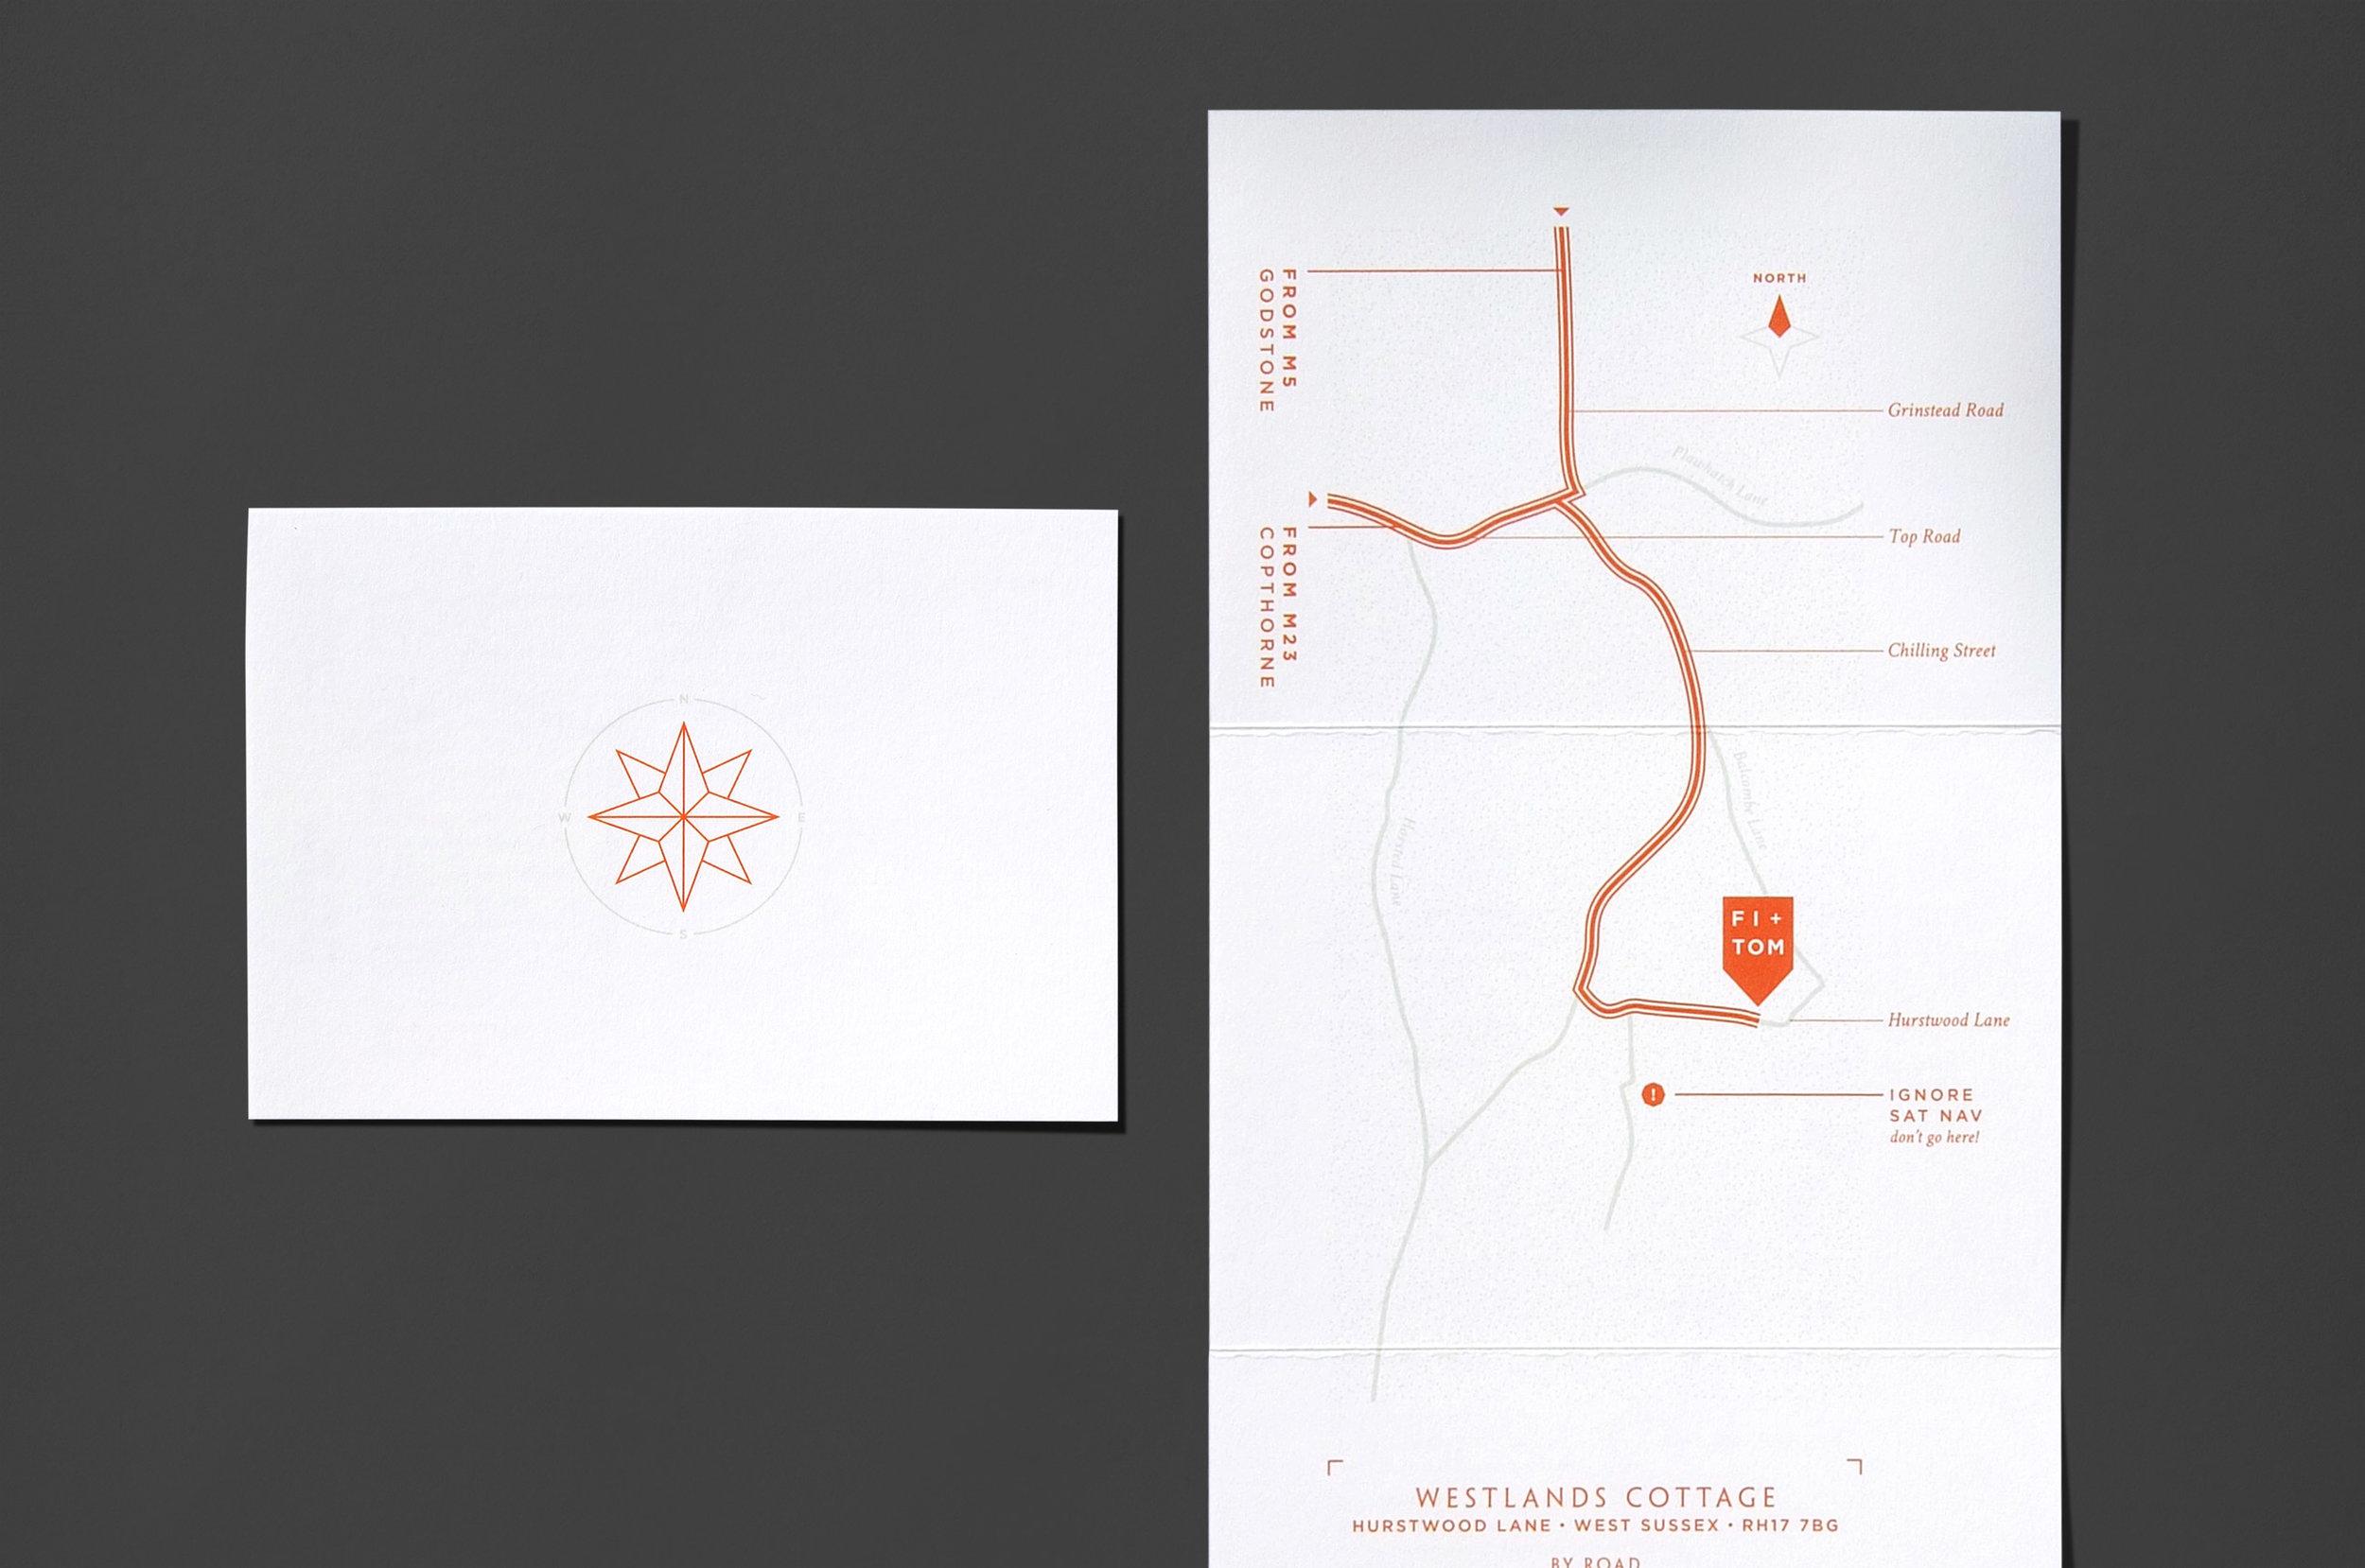 04-FiTom-Map.jpg